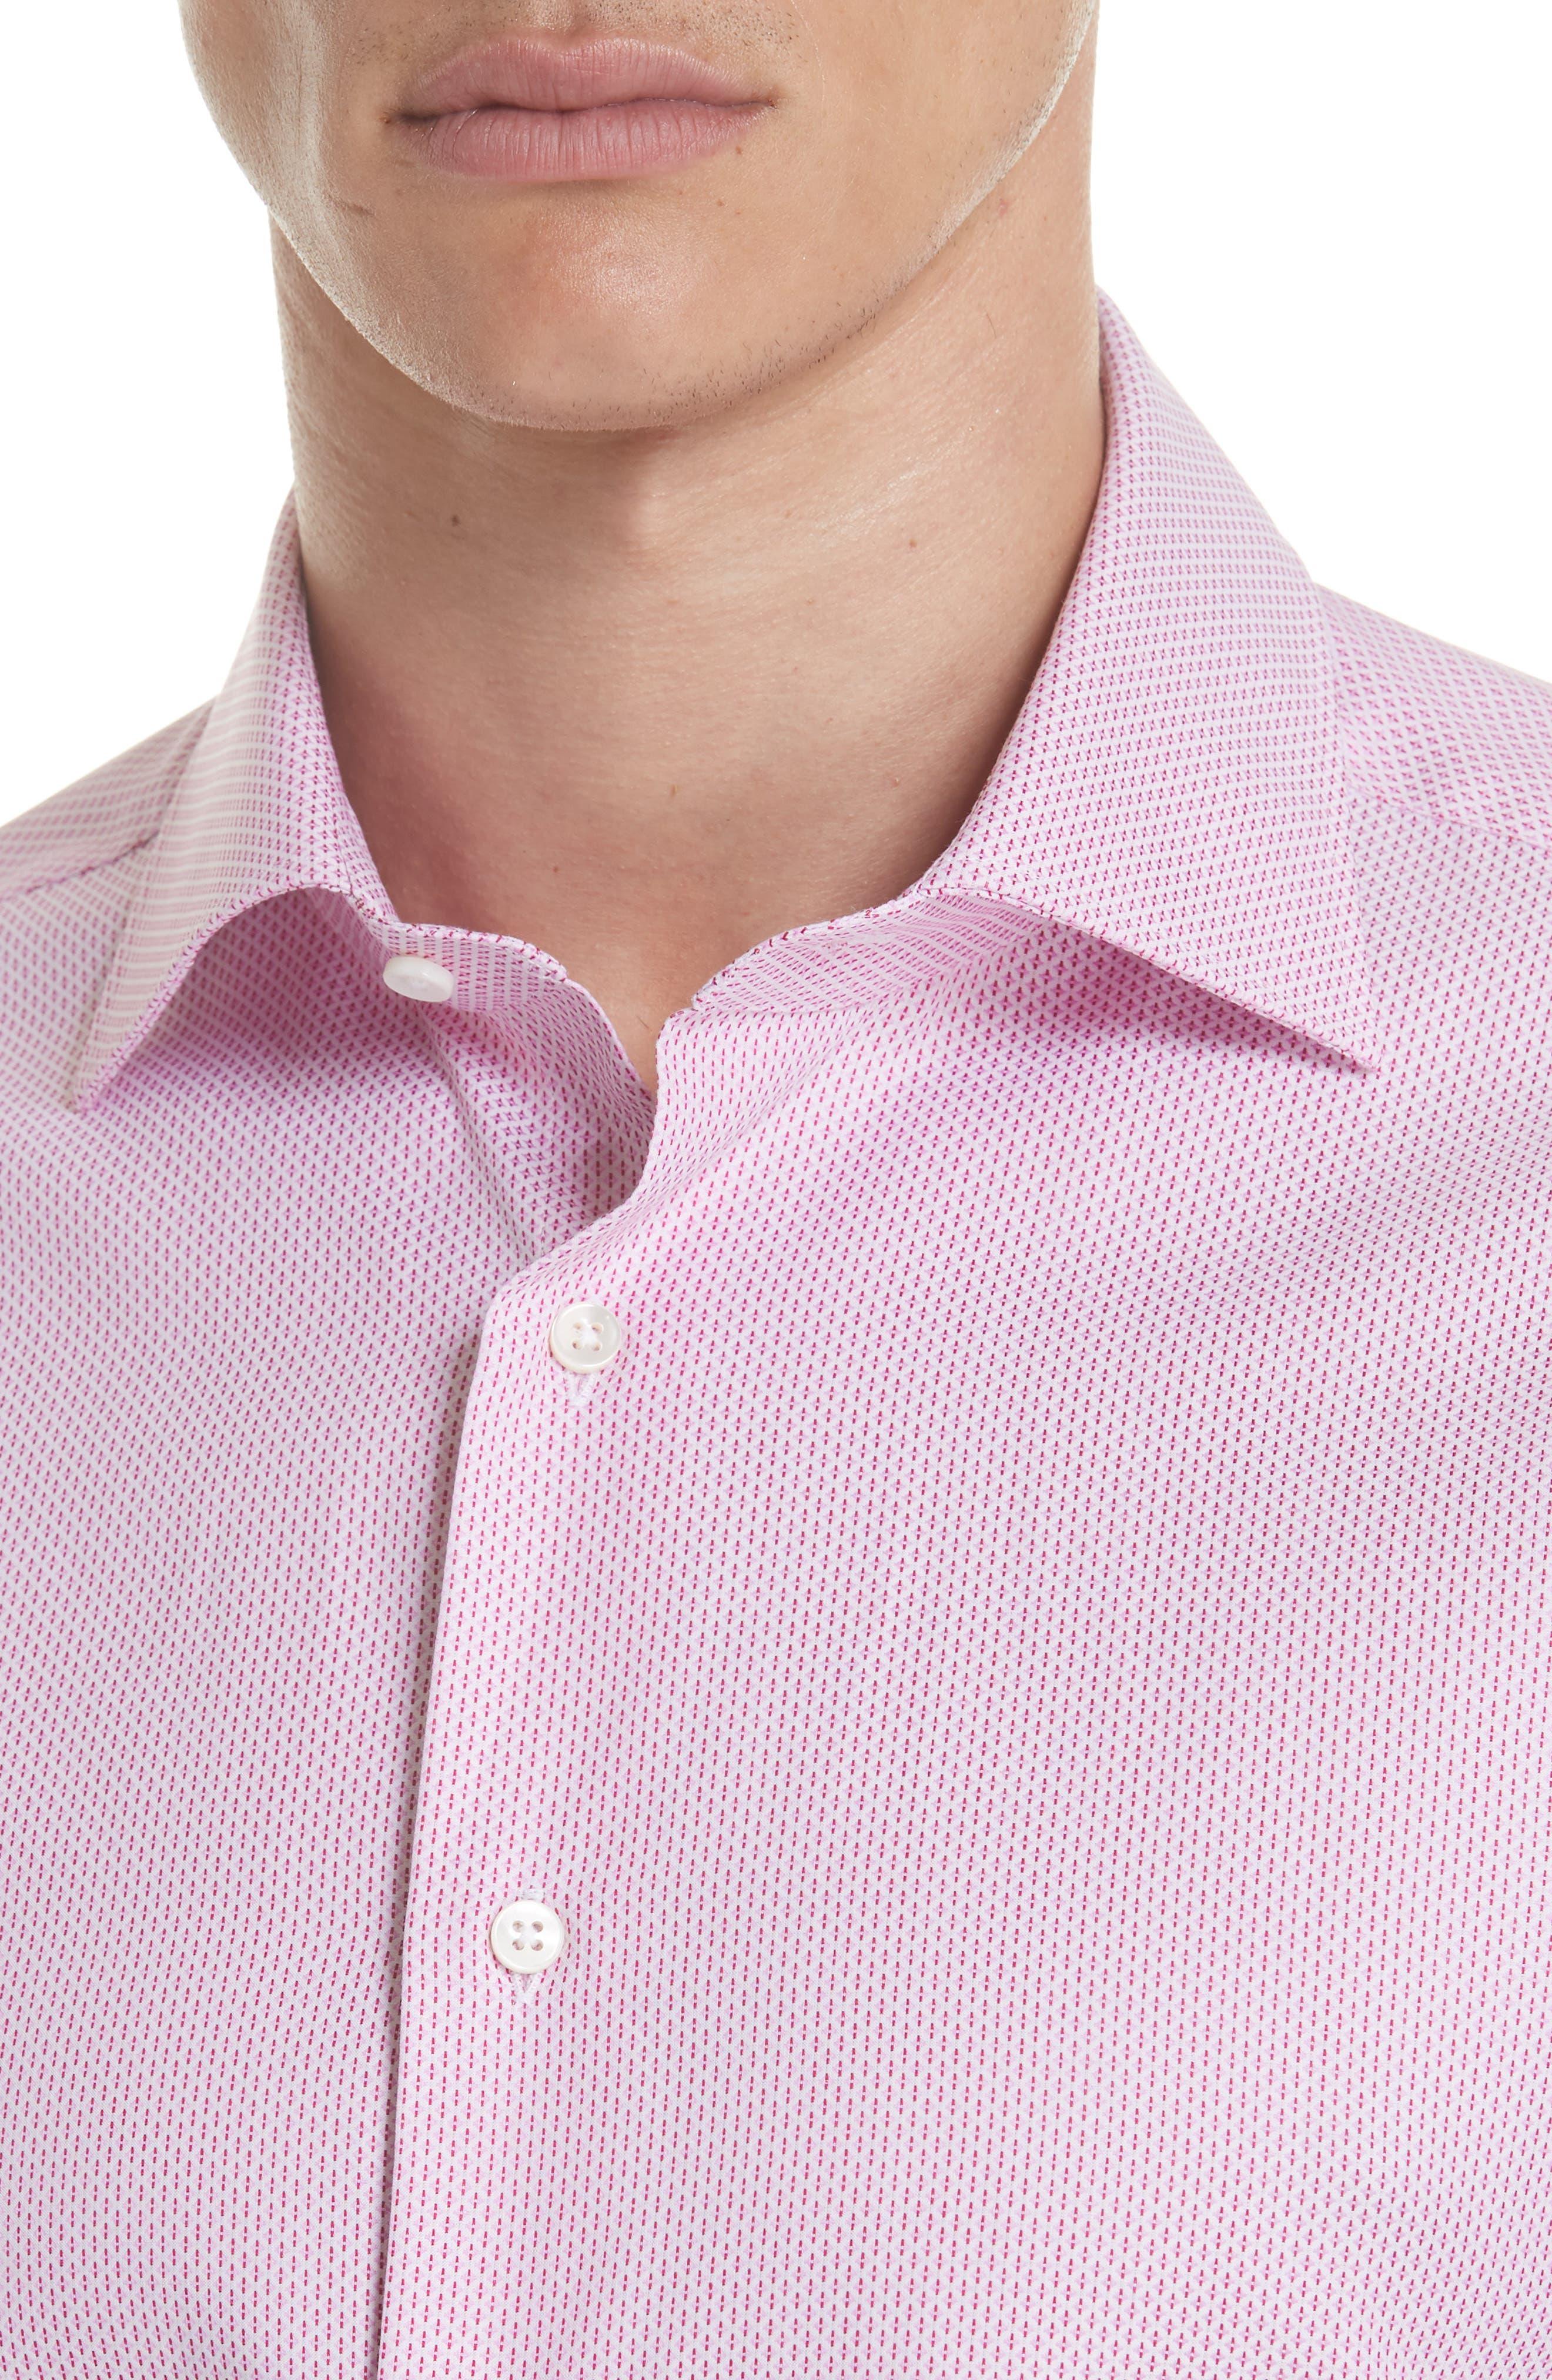 Regular Fit Geometric Print Dress Shirt,                             Alternate thumbnail 2, color,